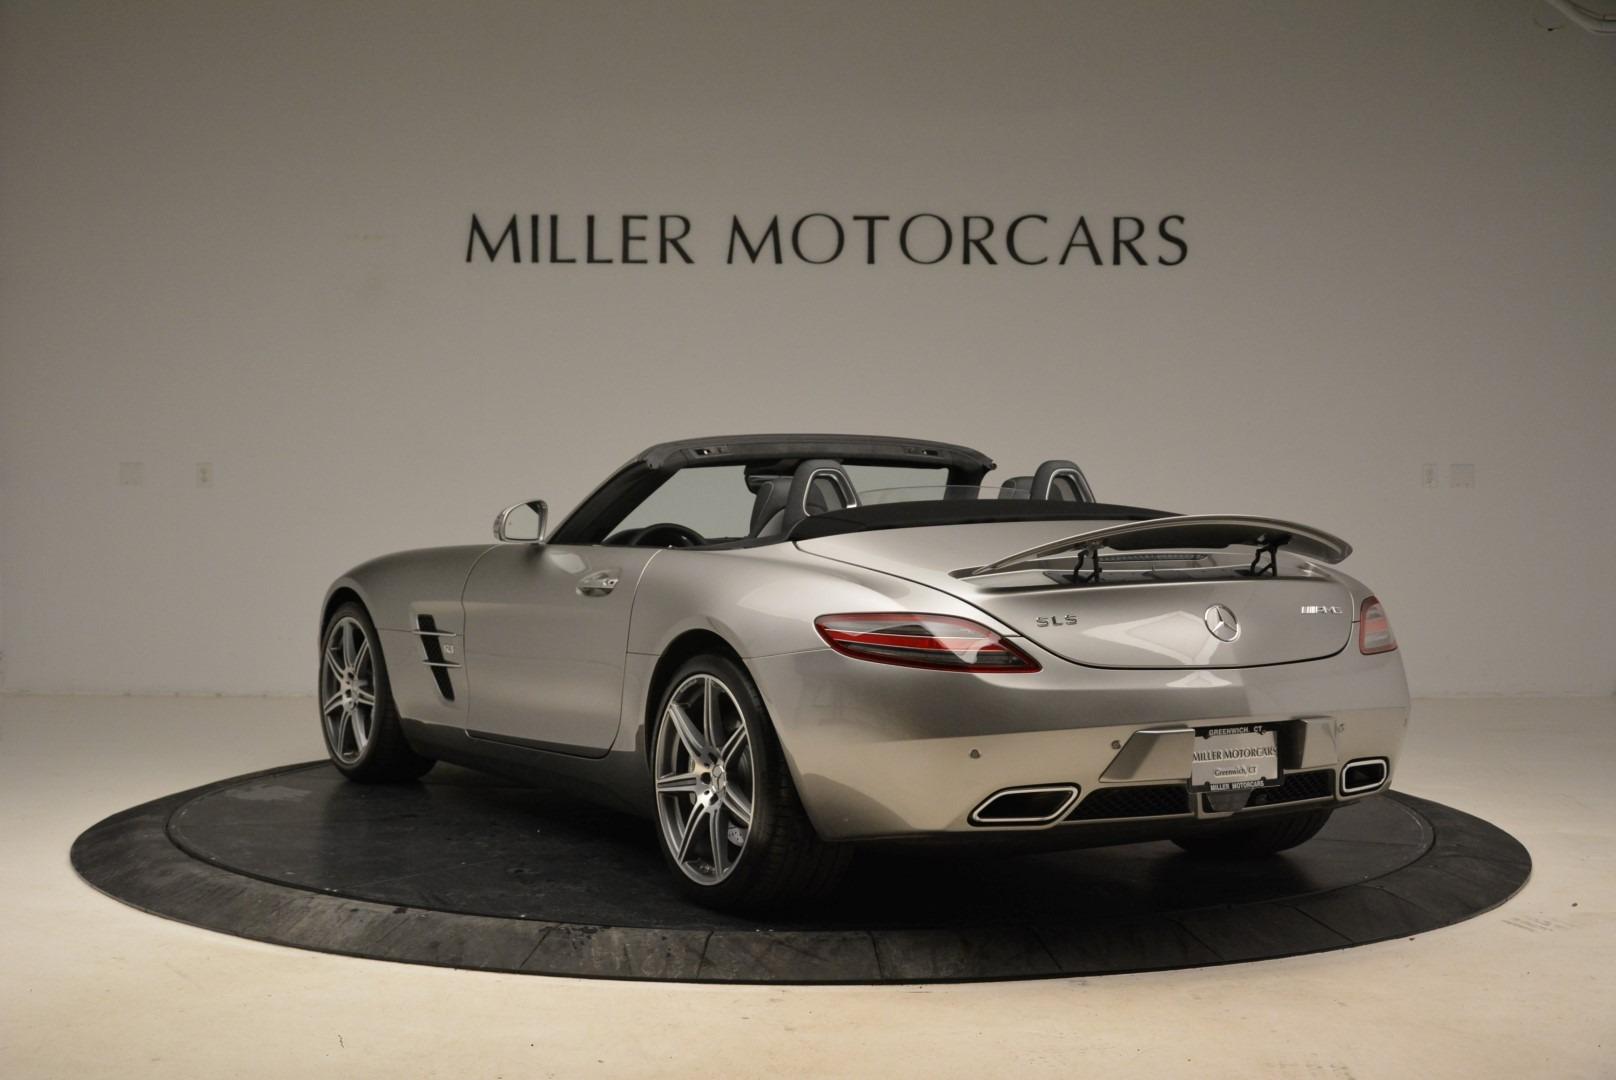 Used 2012 Mercedes-Benz SLS AMG  For Sale In Westport, CT 2068_p5